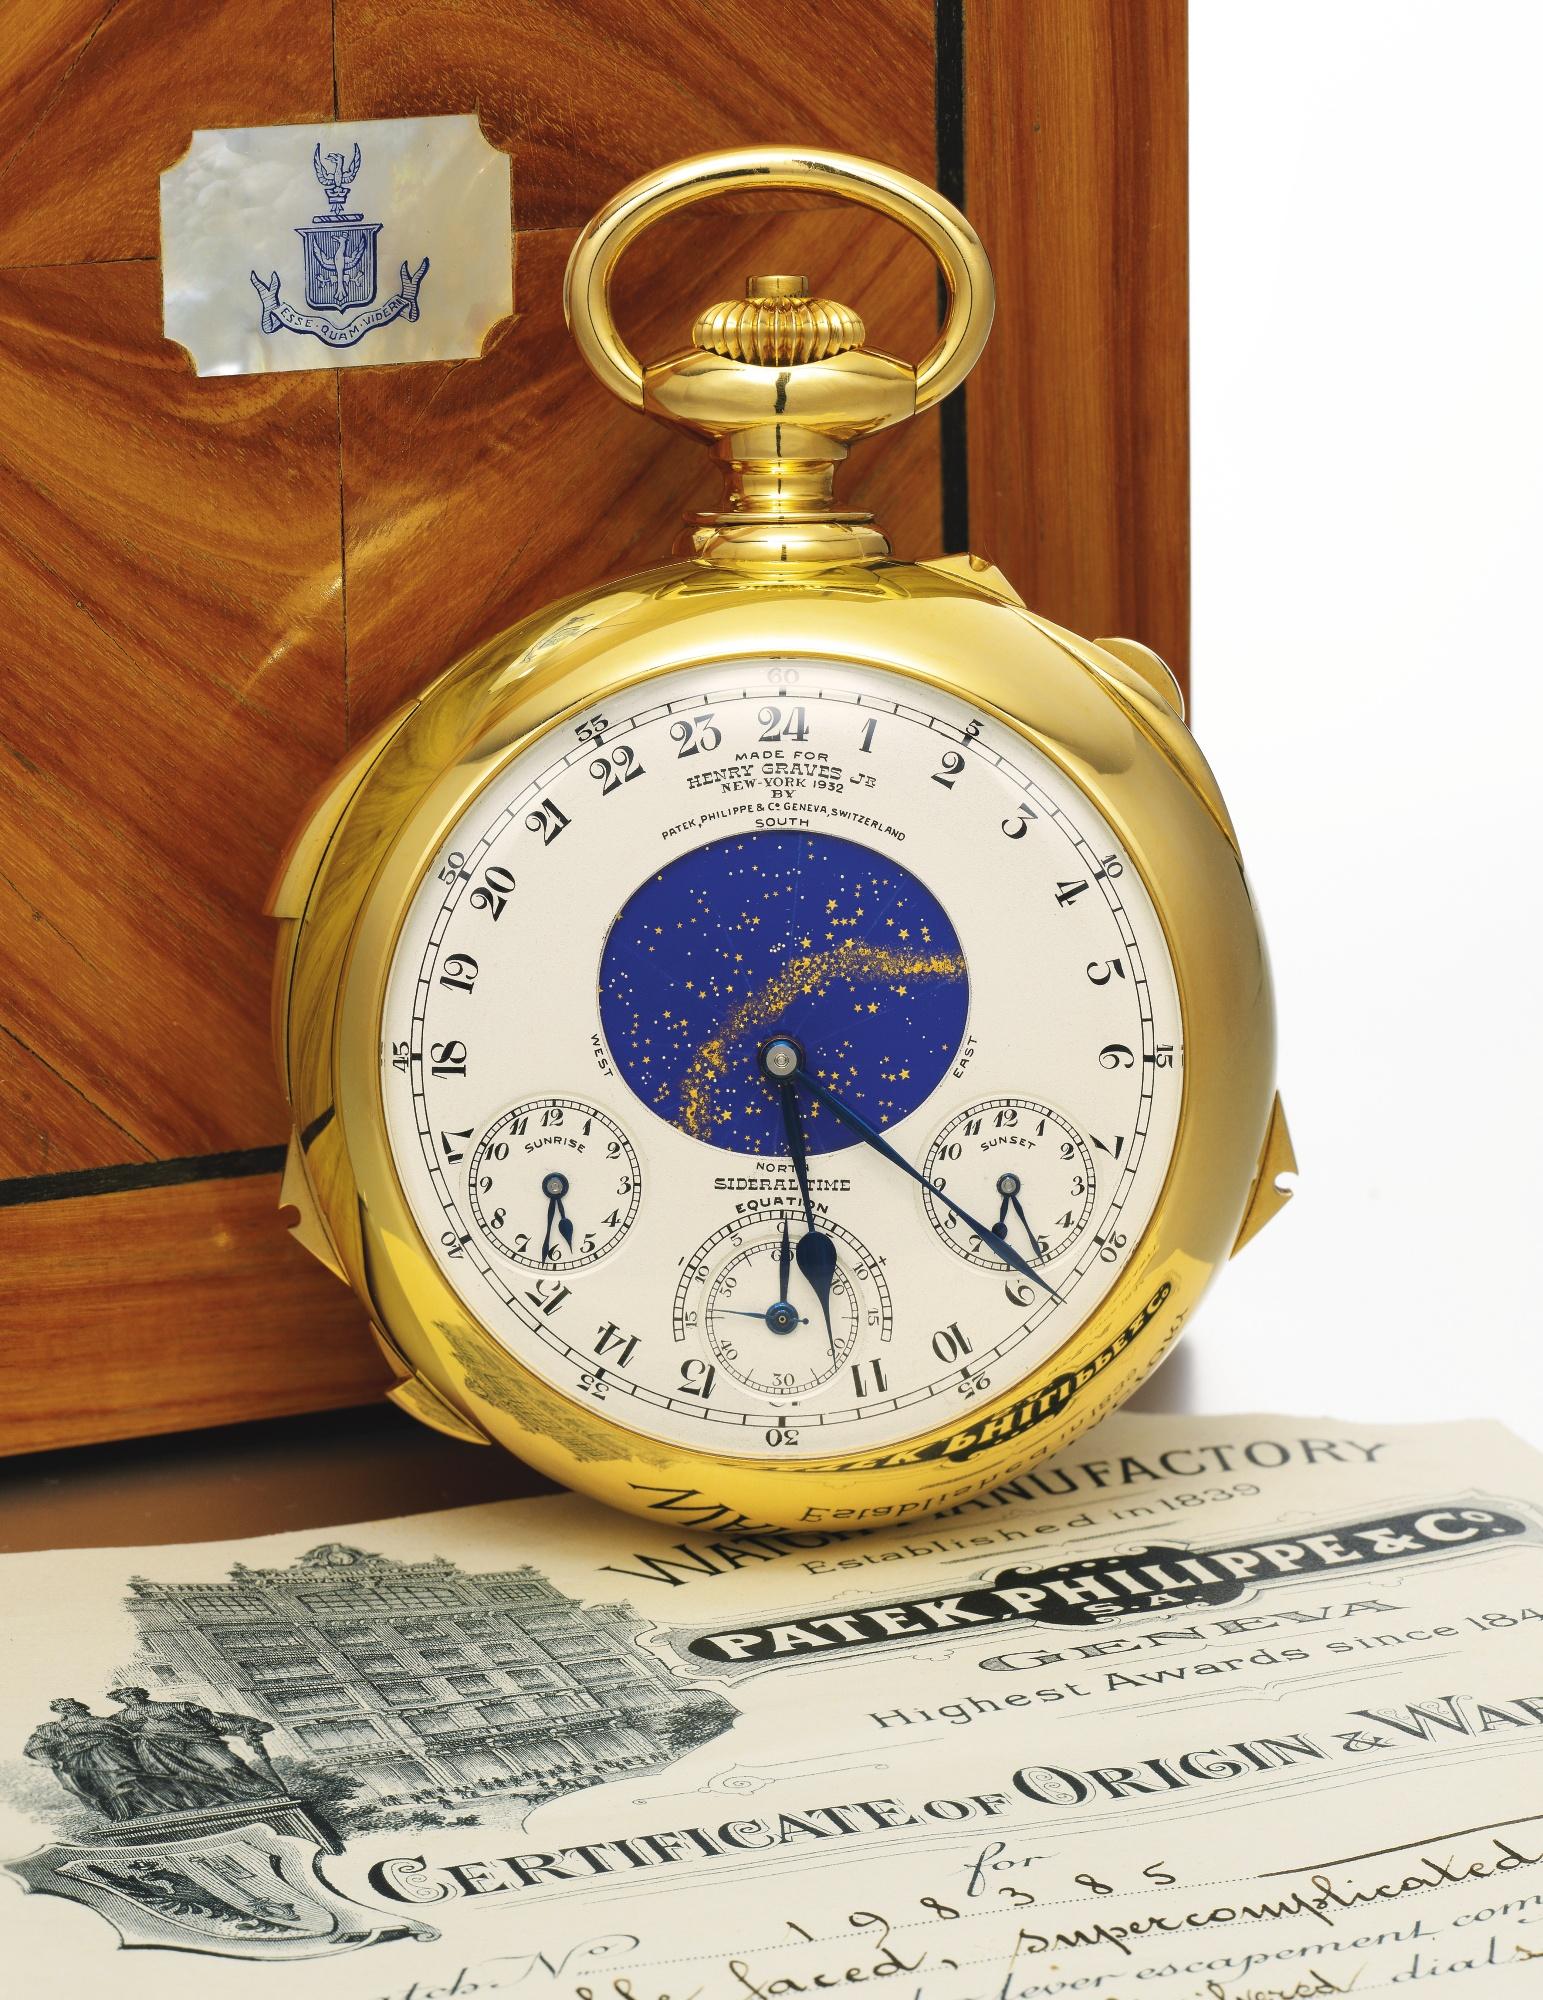 24,000,000 watch Graves Supercomplication